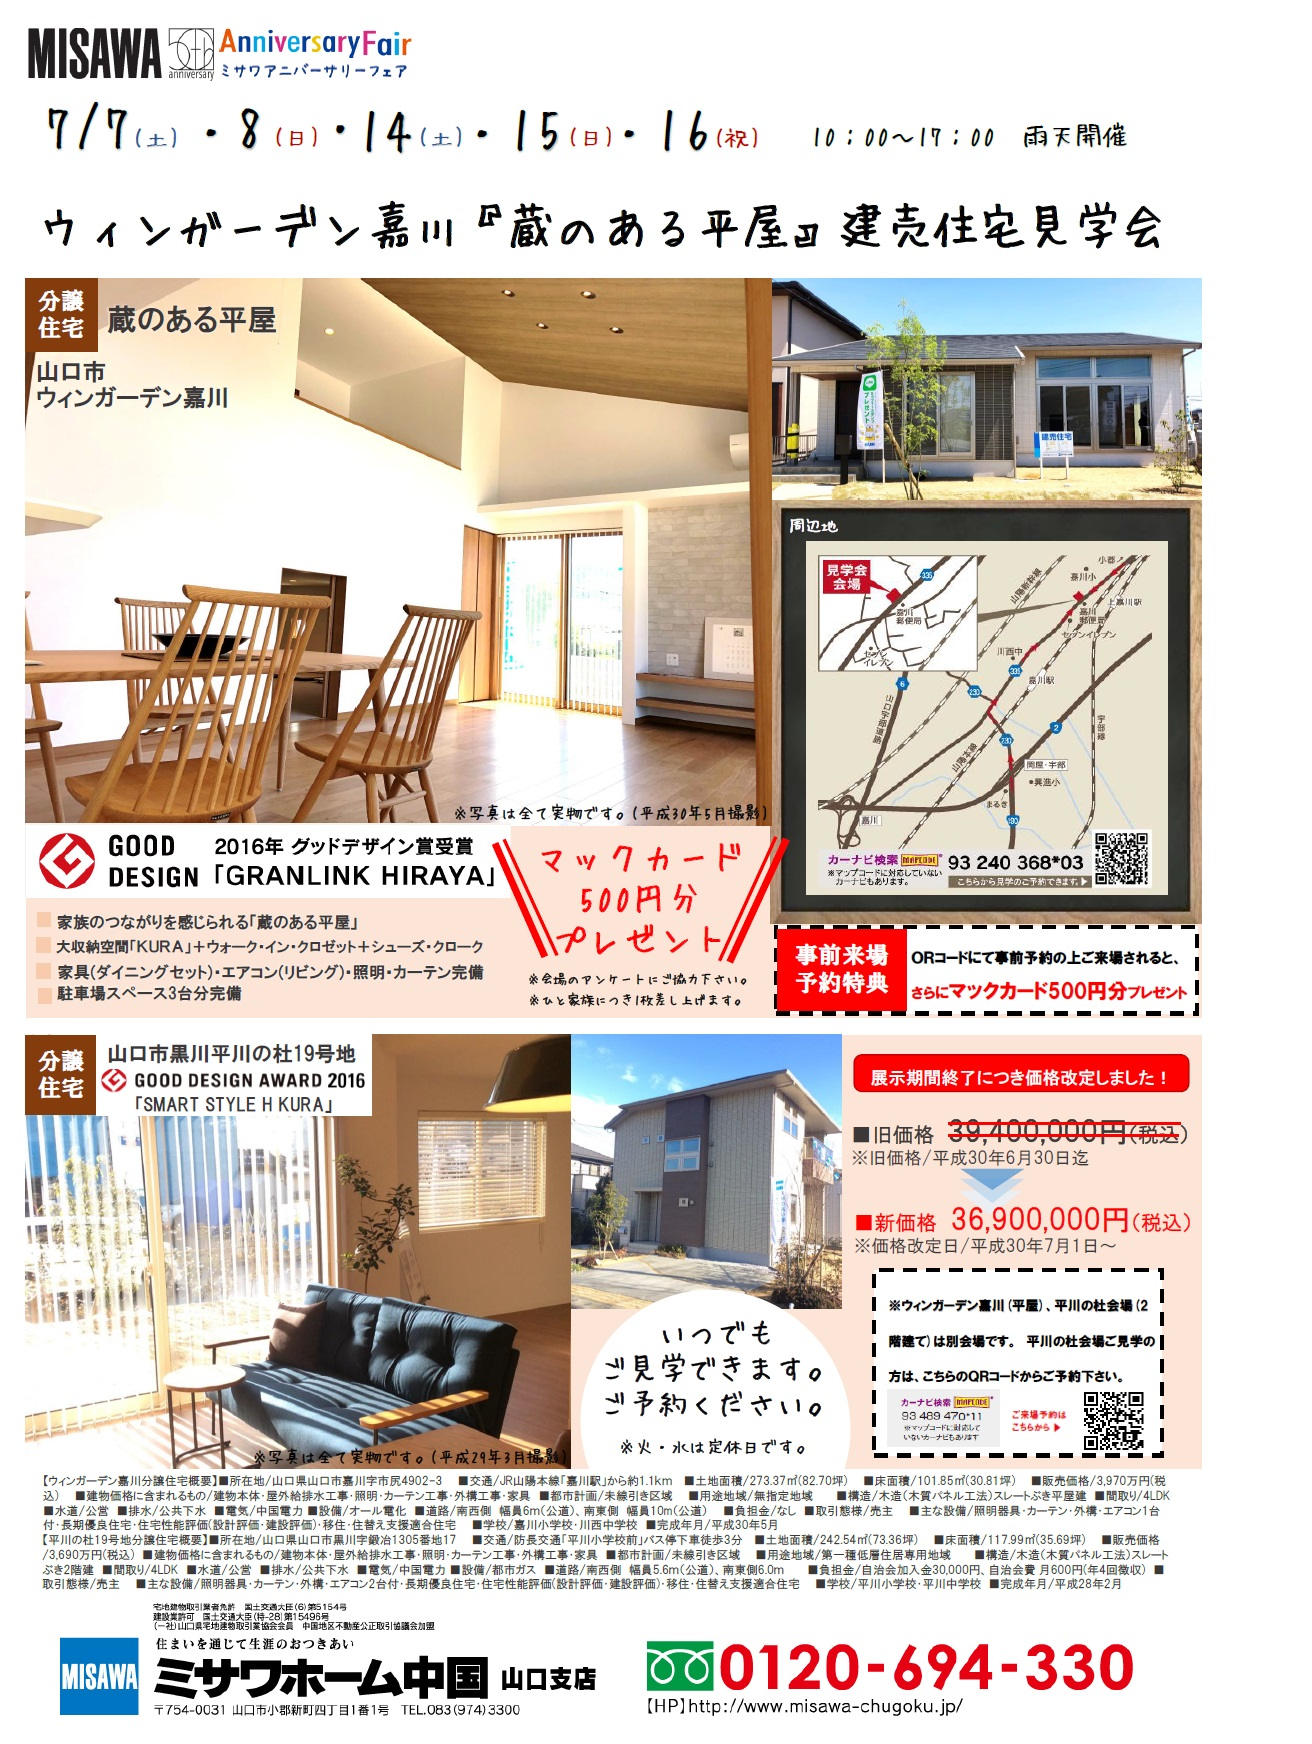 画像:50th AnniversaryFair 見学会&平川の杜建売住宅価格改定!!